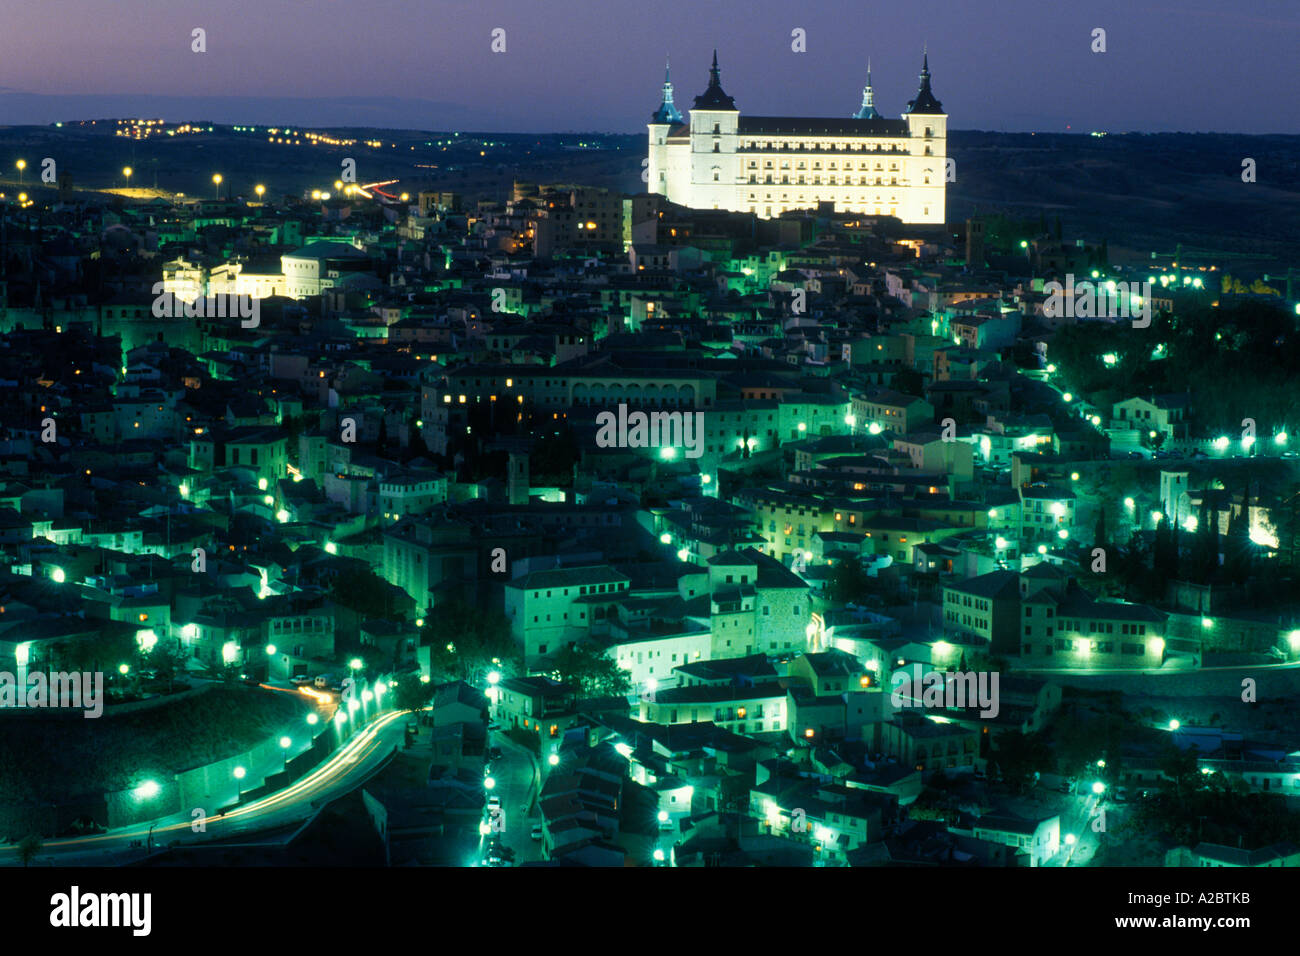 Europe Spain Toledo Spain La Mancha Province of Castilla Castillian The Alcazar Illuminated at Night Stock Photo